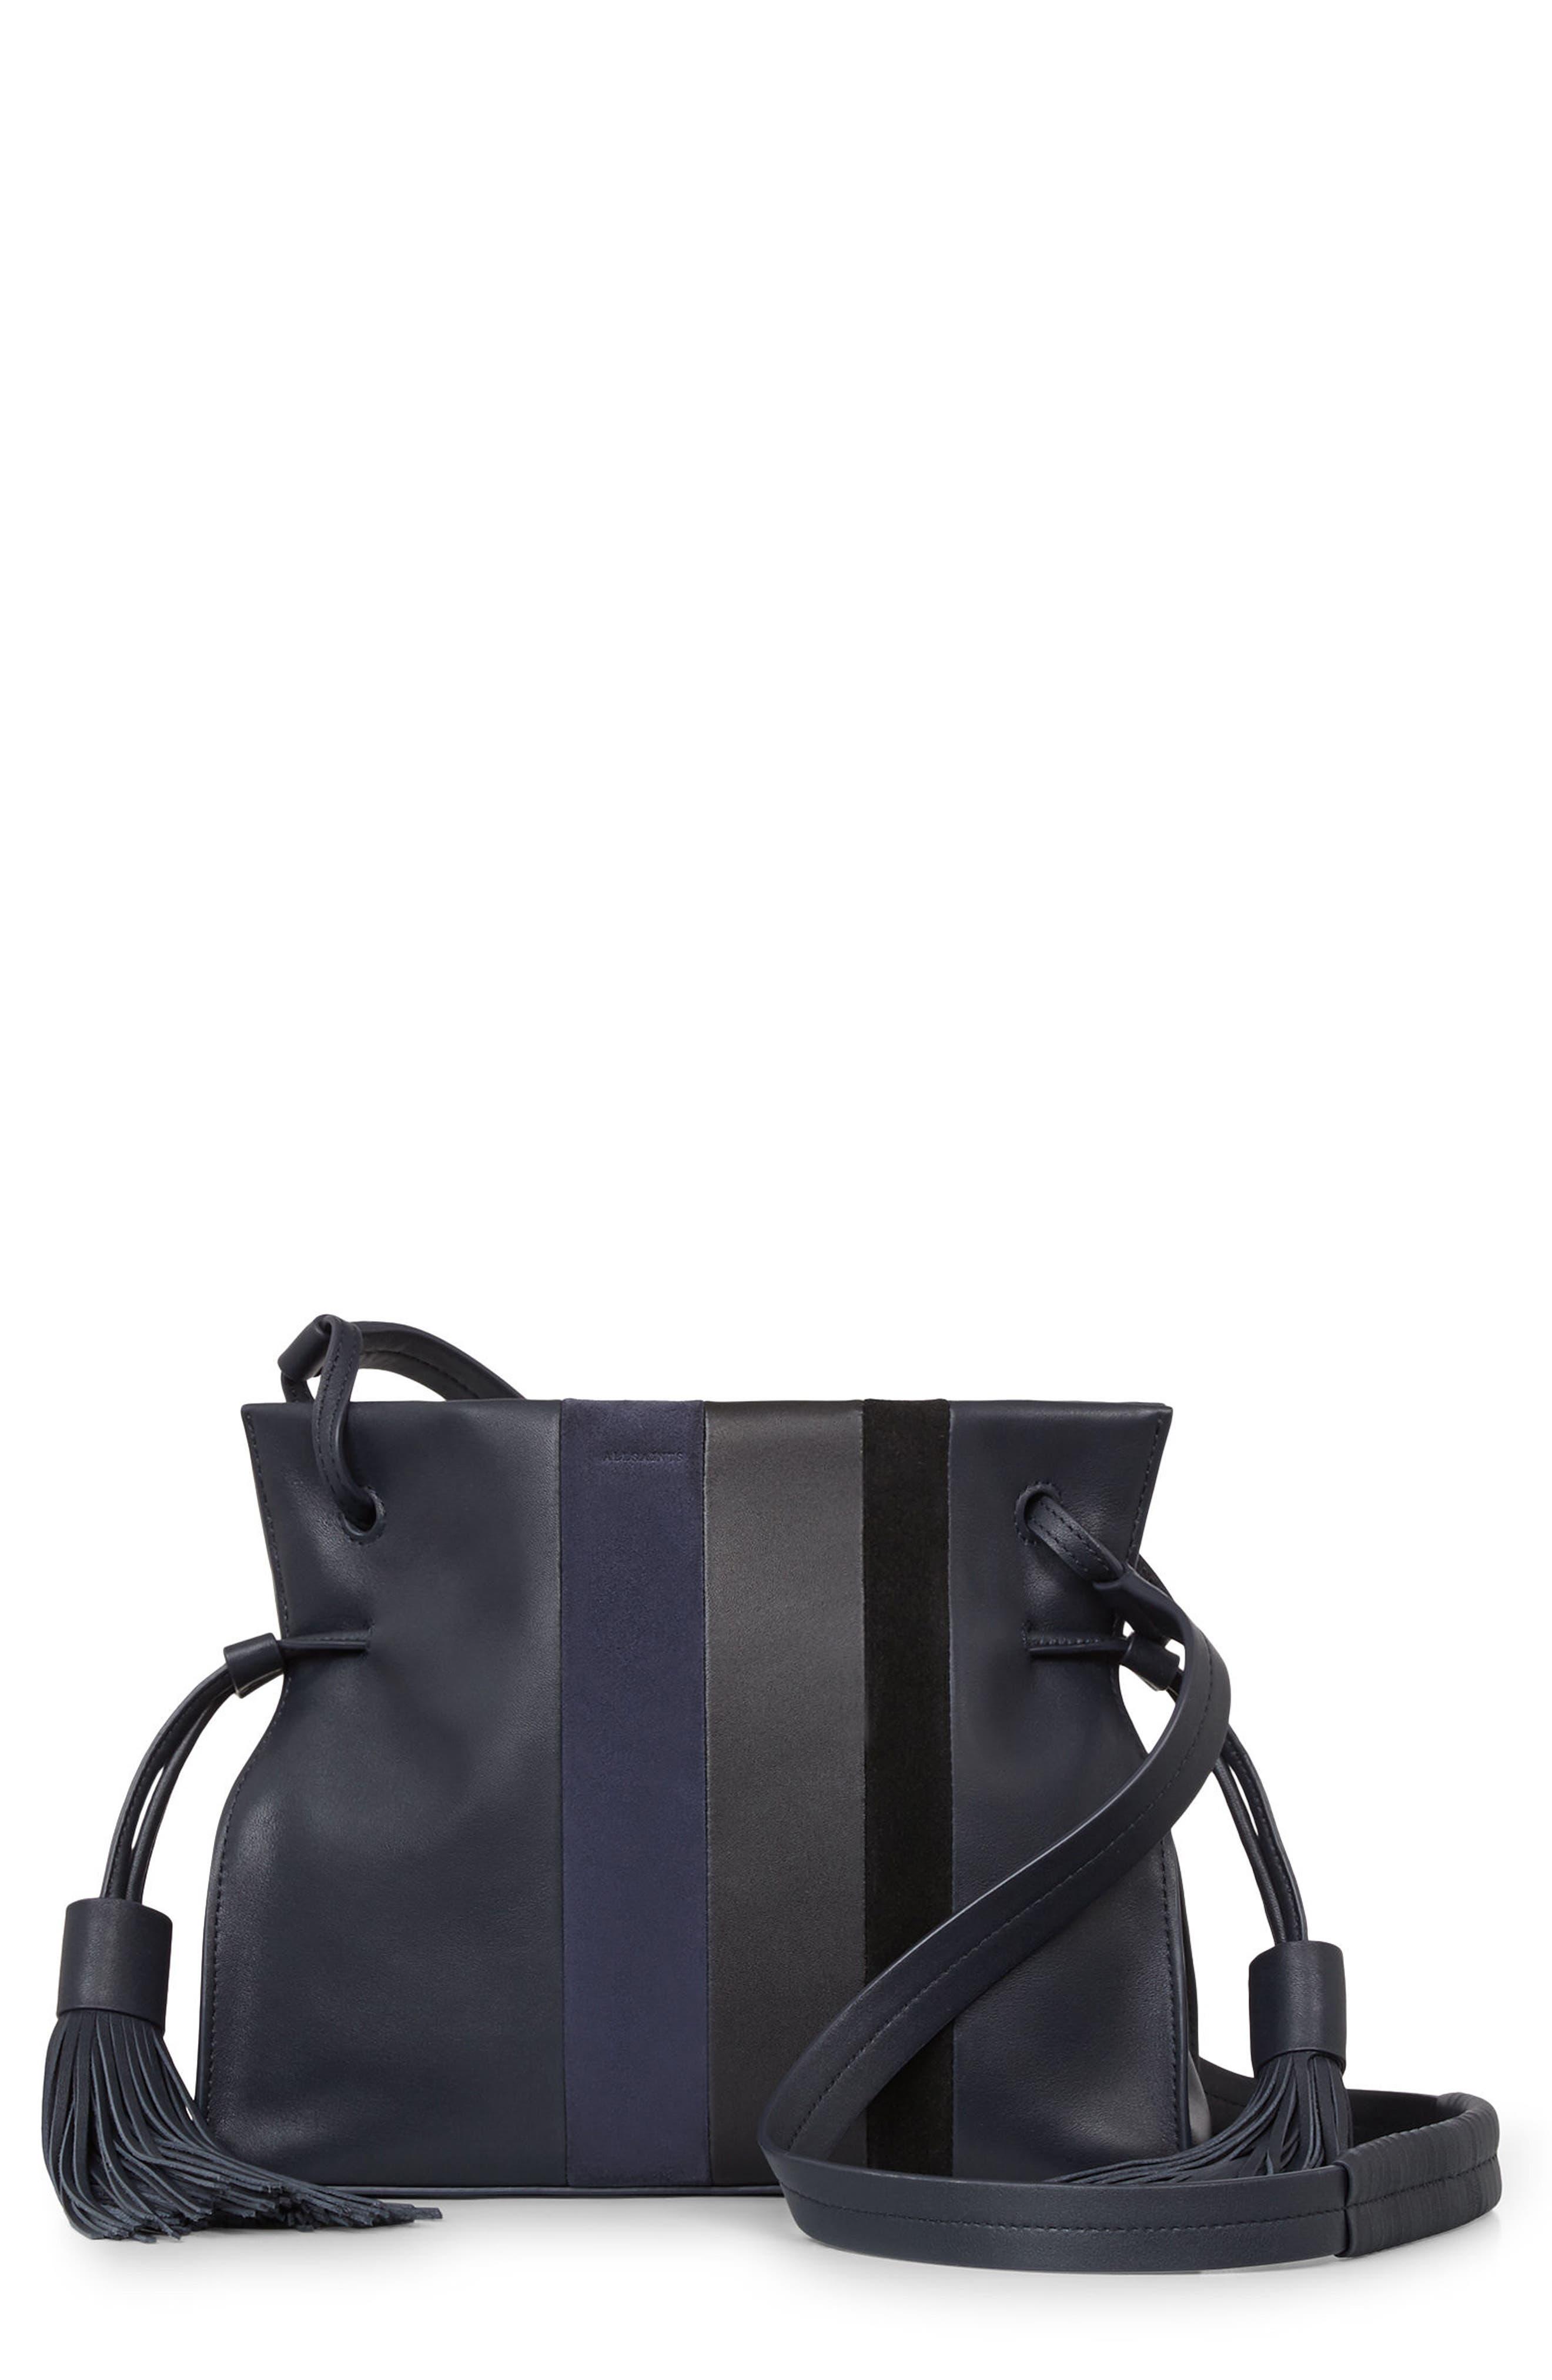 ALLSAINTS Casey Calfskin Leather & Suede Tassel Crossbody Bag